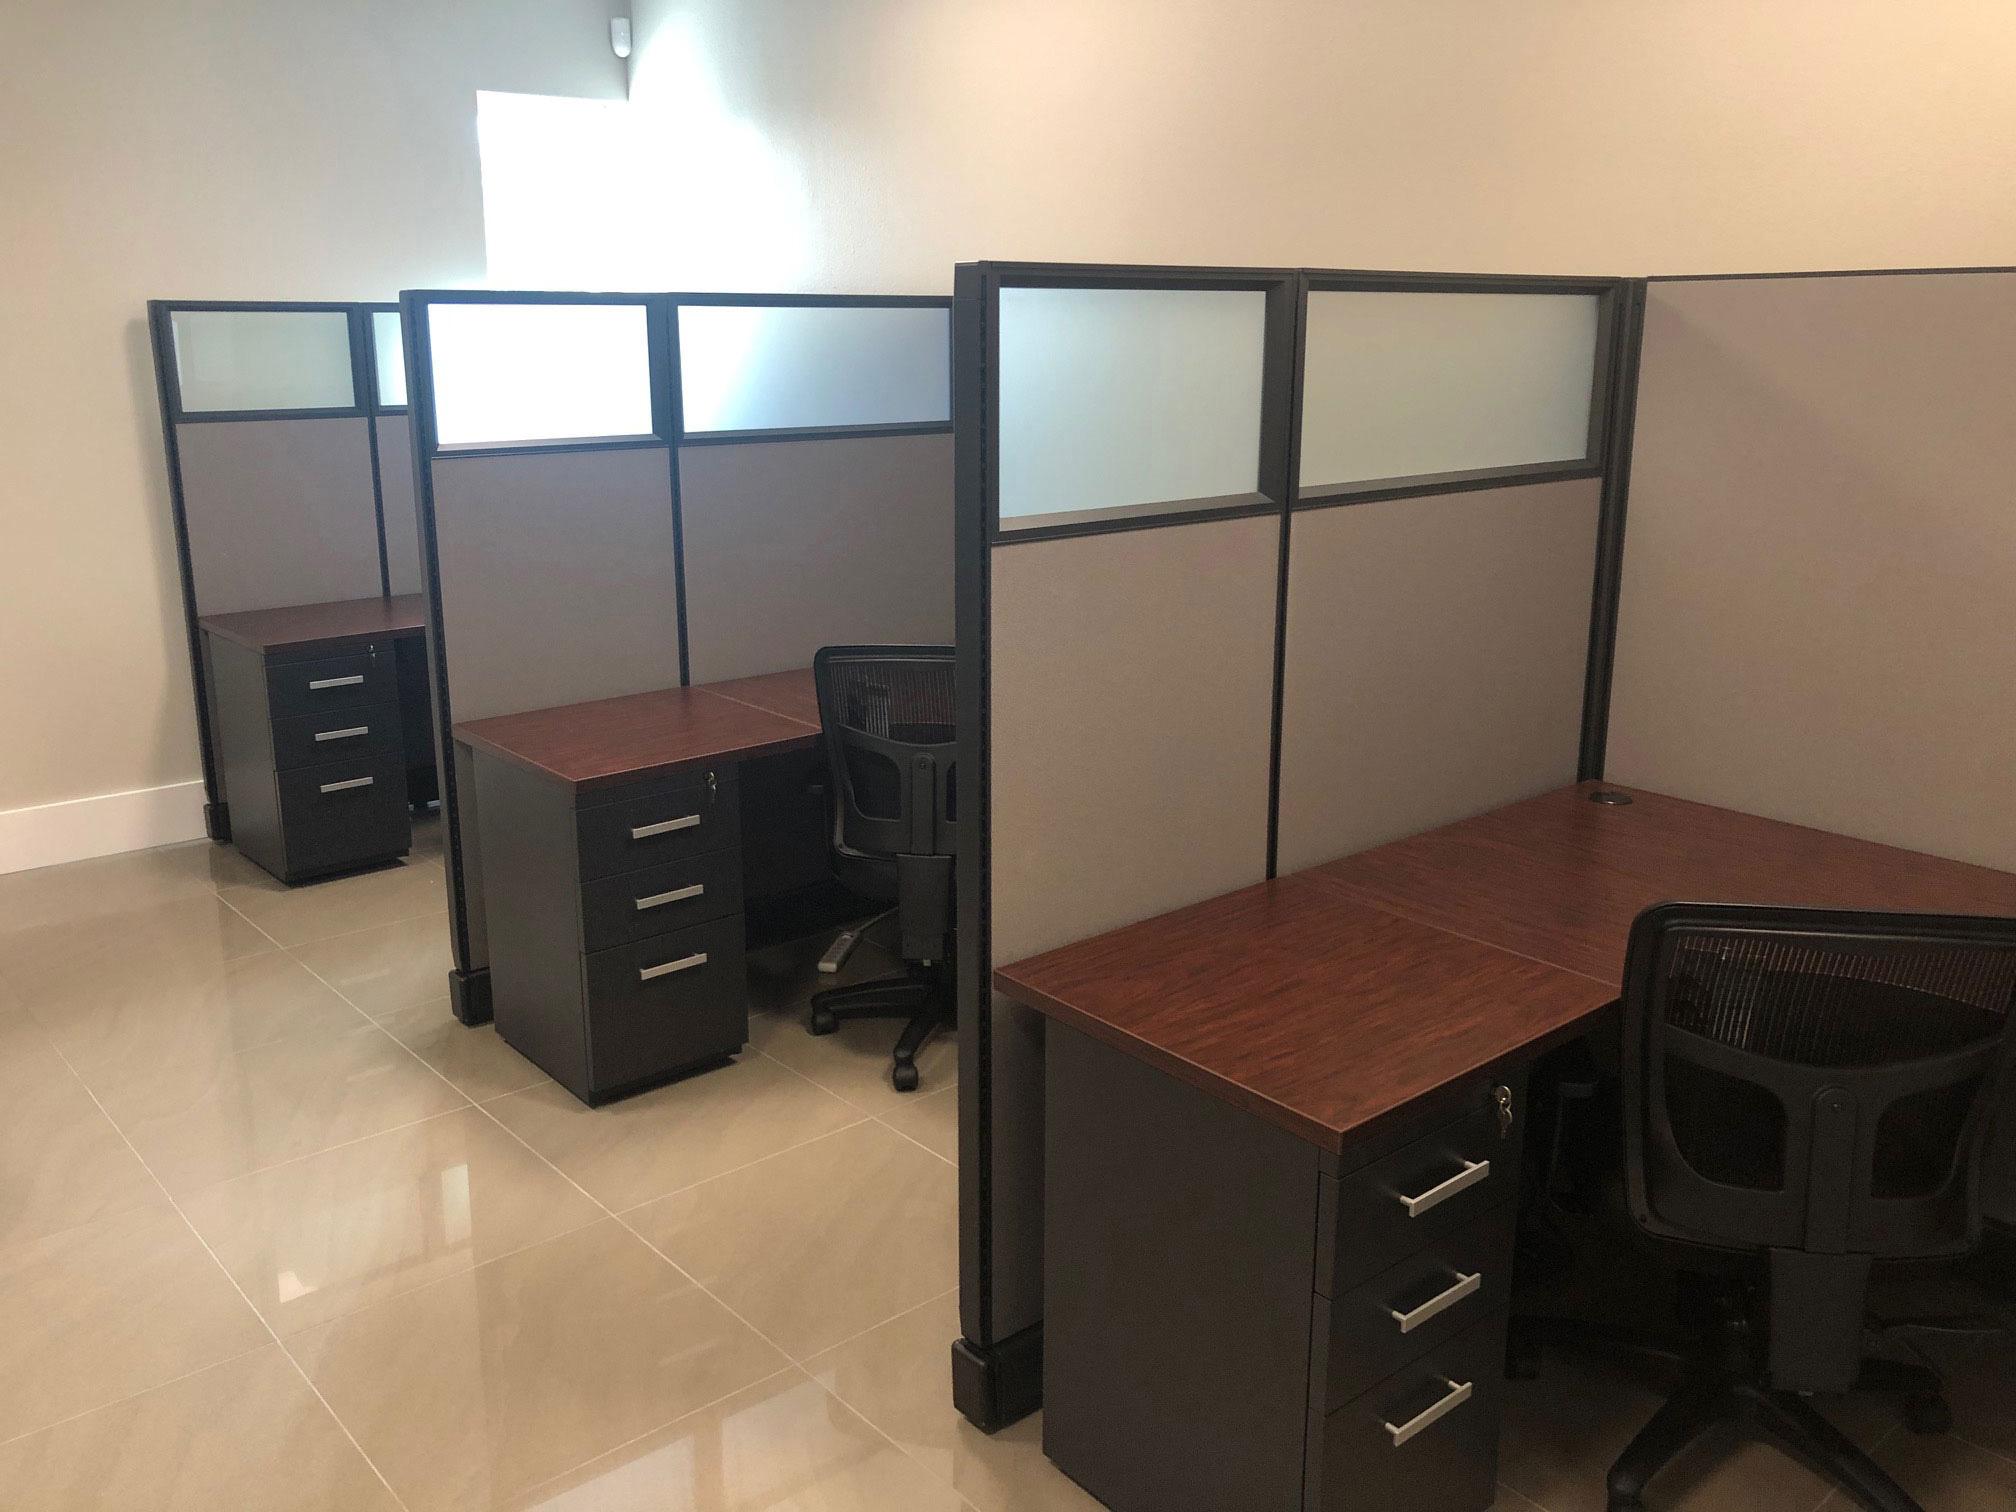 office-cubicle-furniture-suppliers-in-apopka-florida-3.jpg